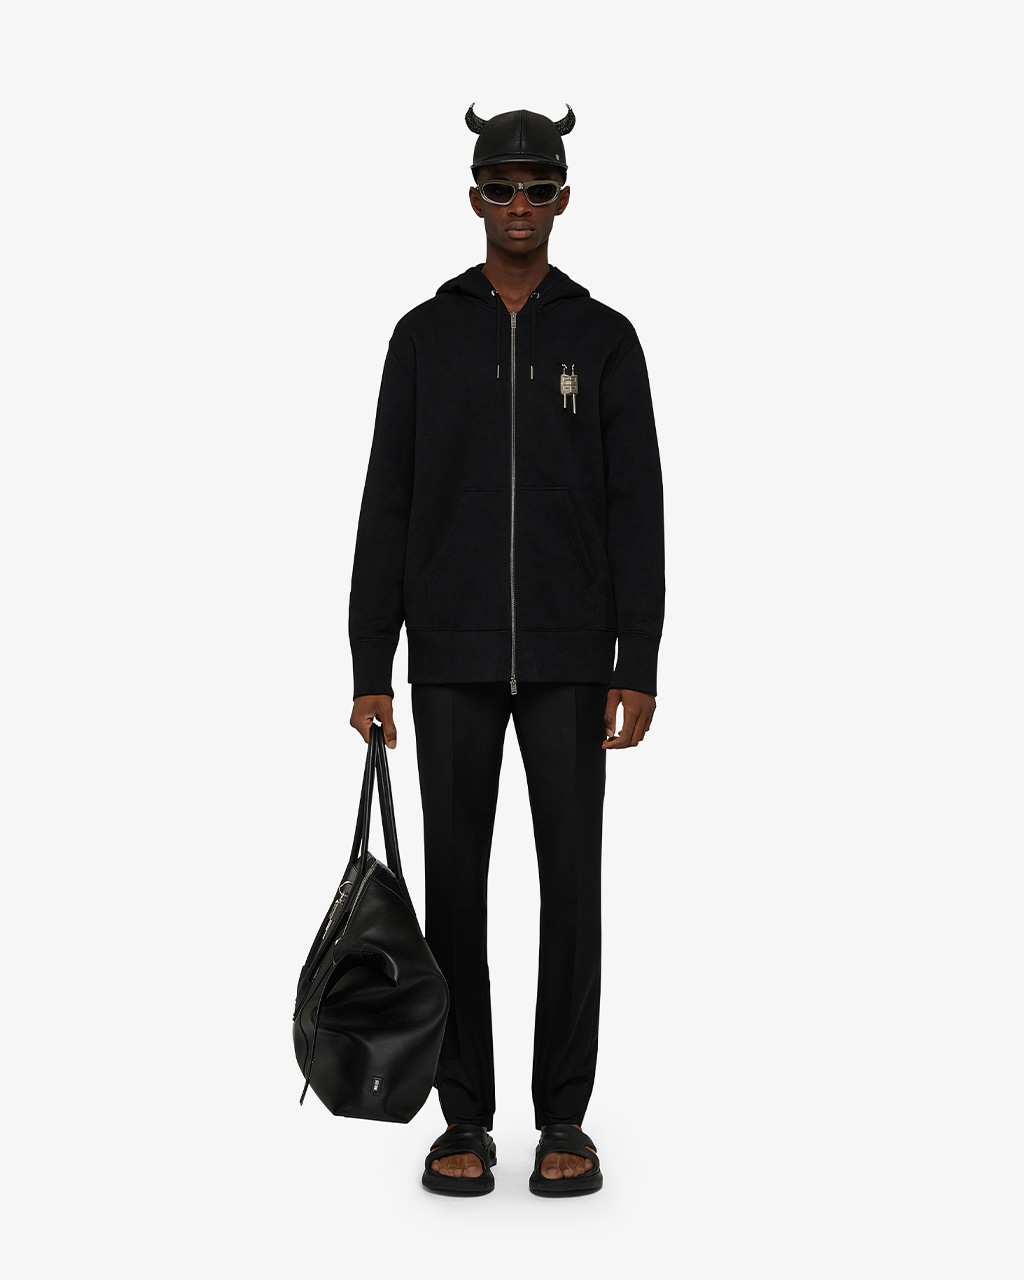 New Antigona Bag Look 1